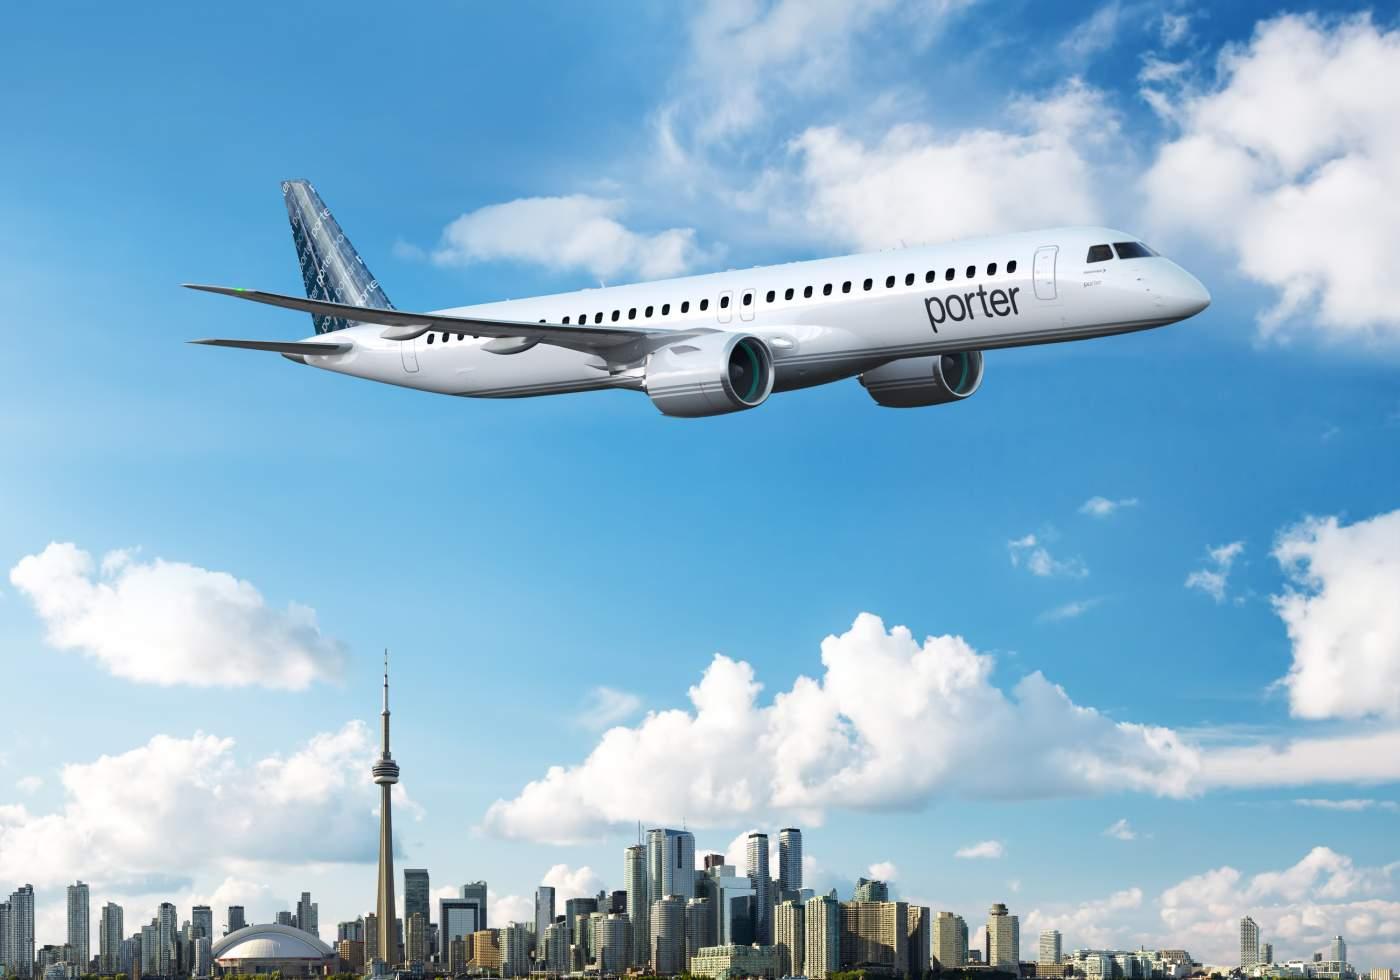 Porter Airlines Embraer 195-E2